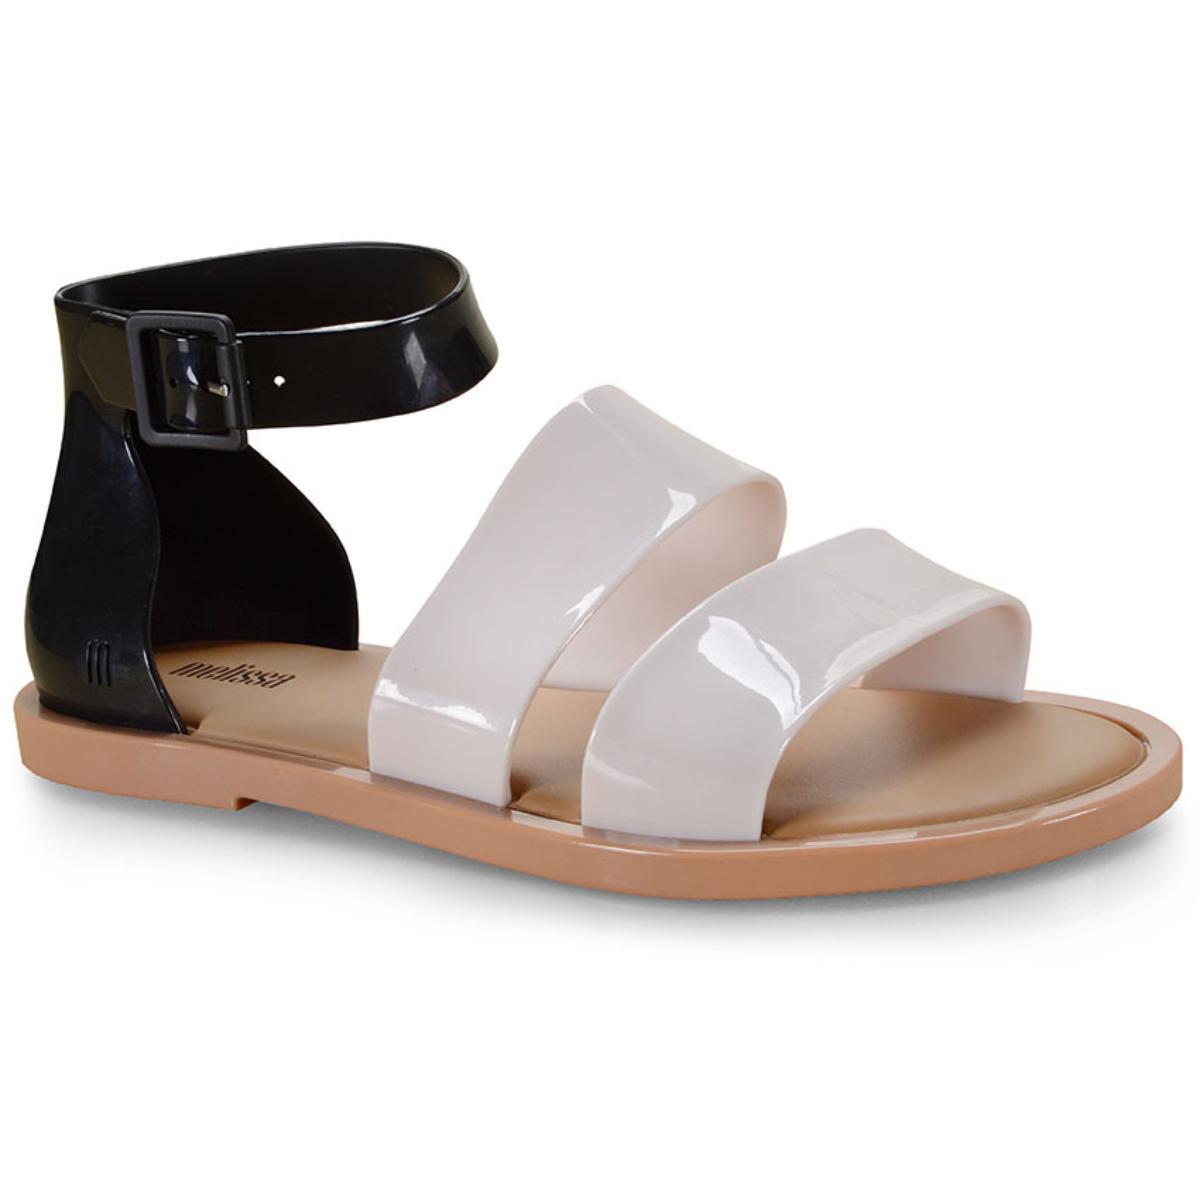 Sandália Feminina Melissa 32797 53670 Model Sandal Bege/preto